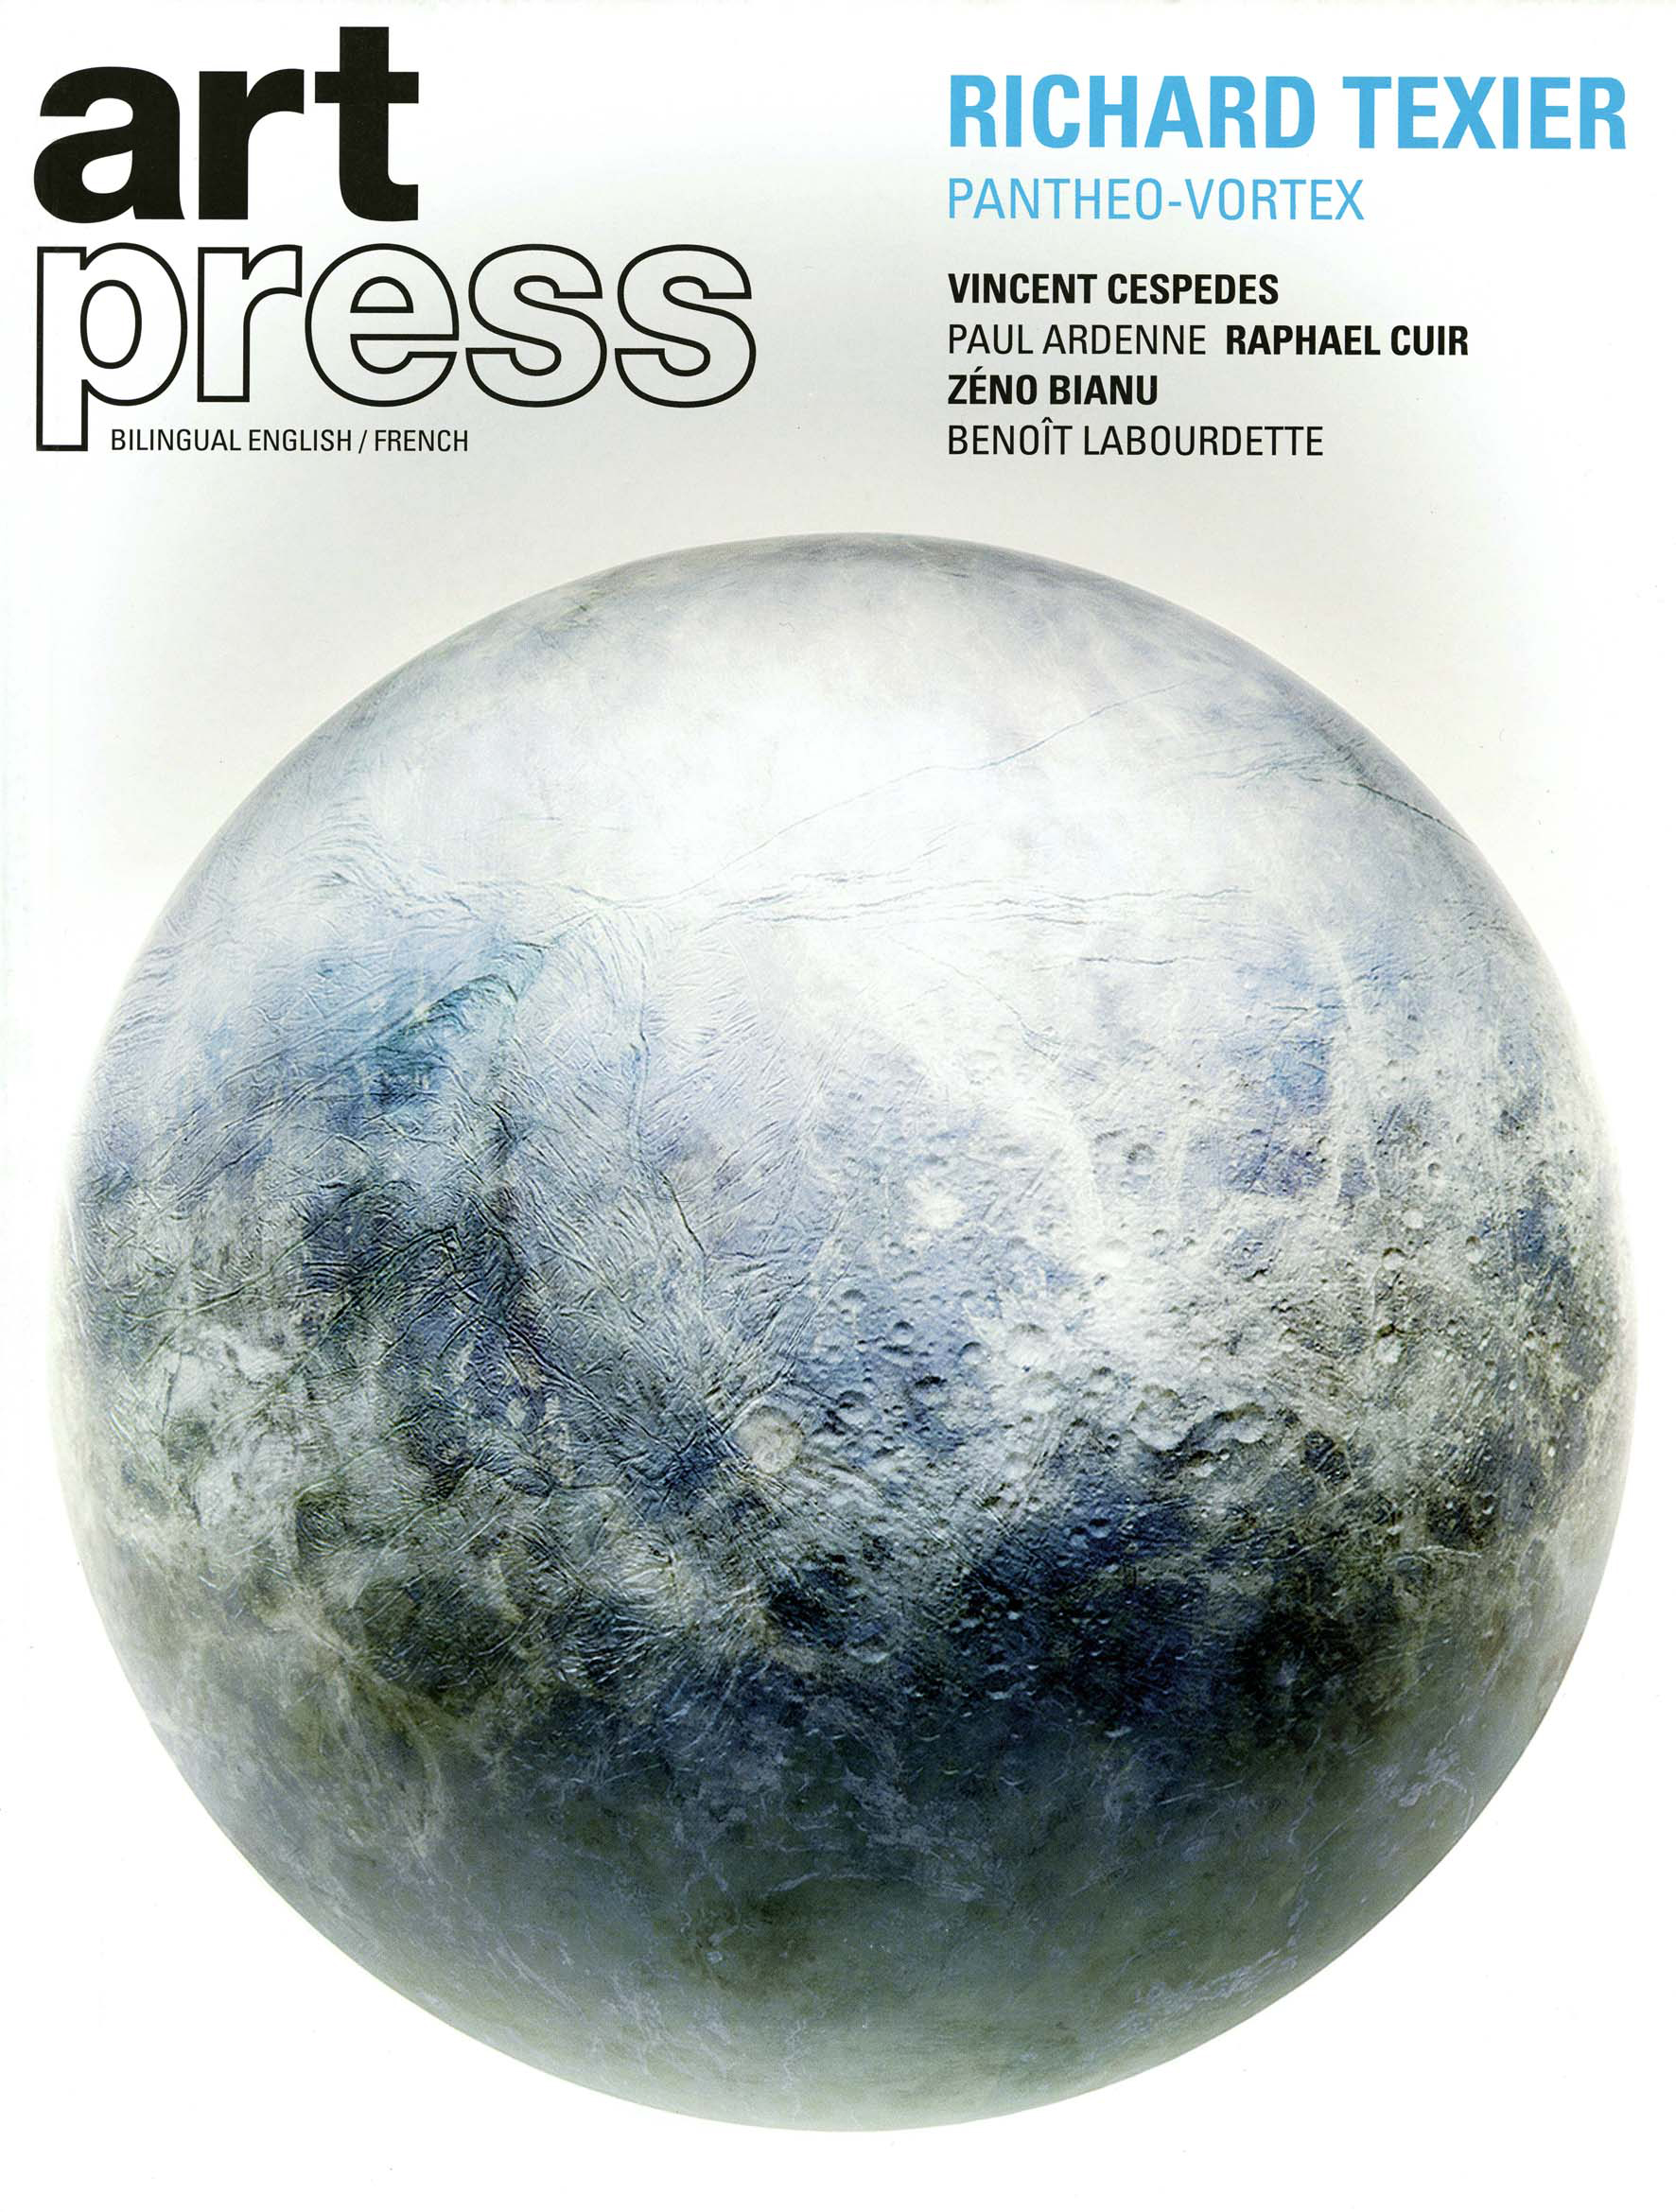 Art Press Cover Richard Texier - Pantheo Vortex and Elastogenese